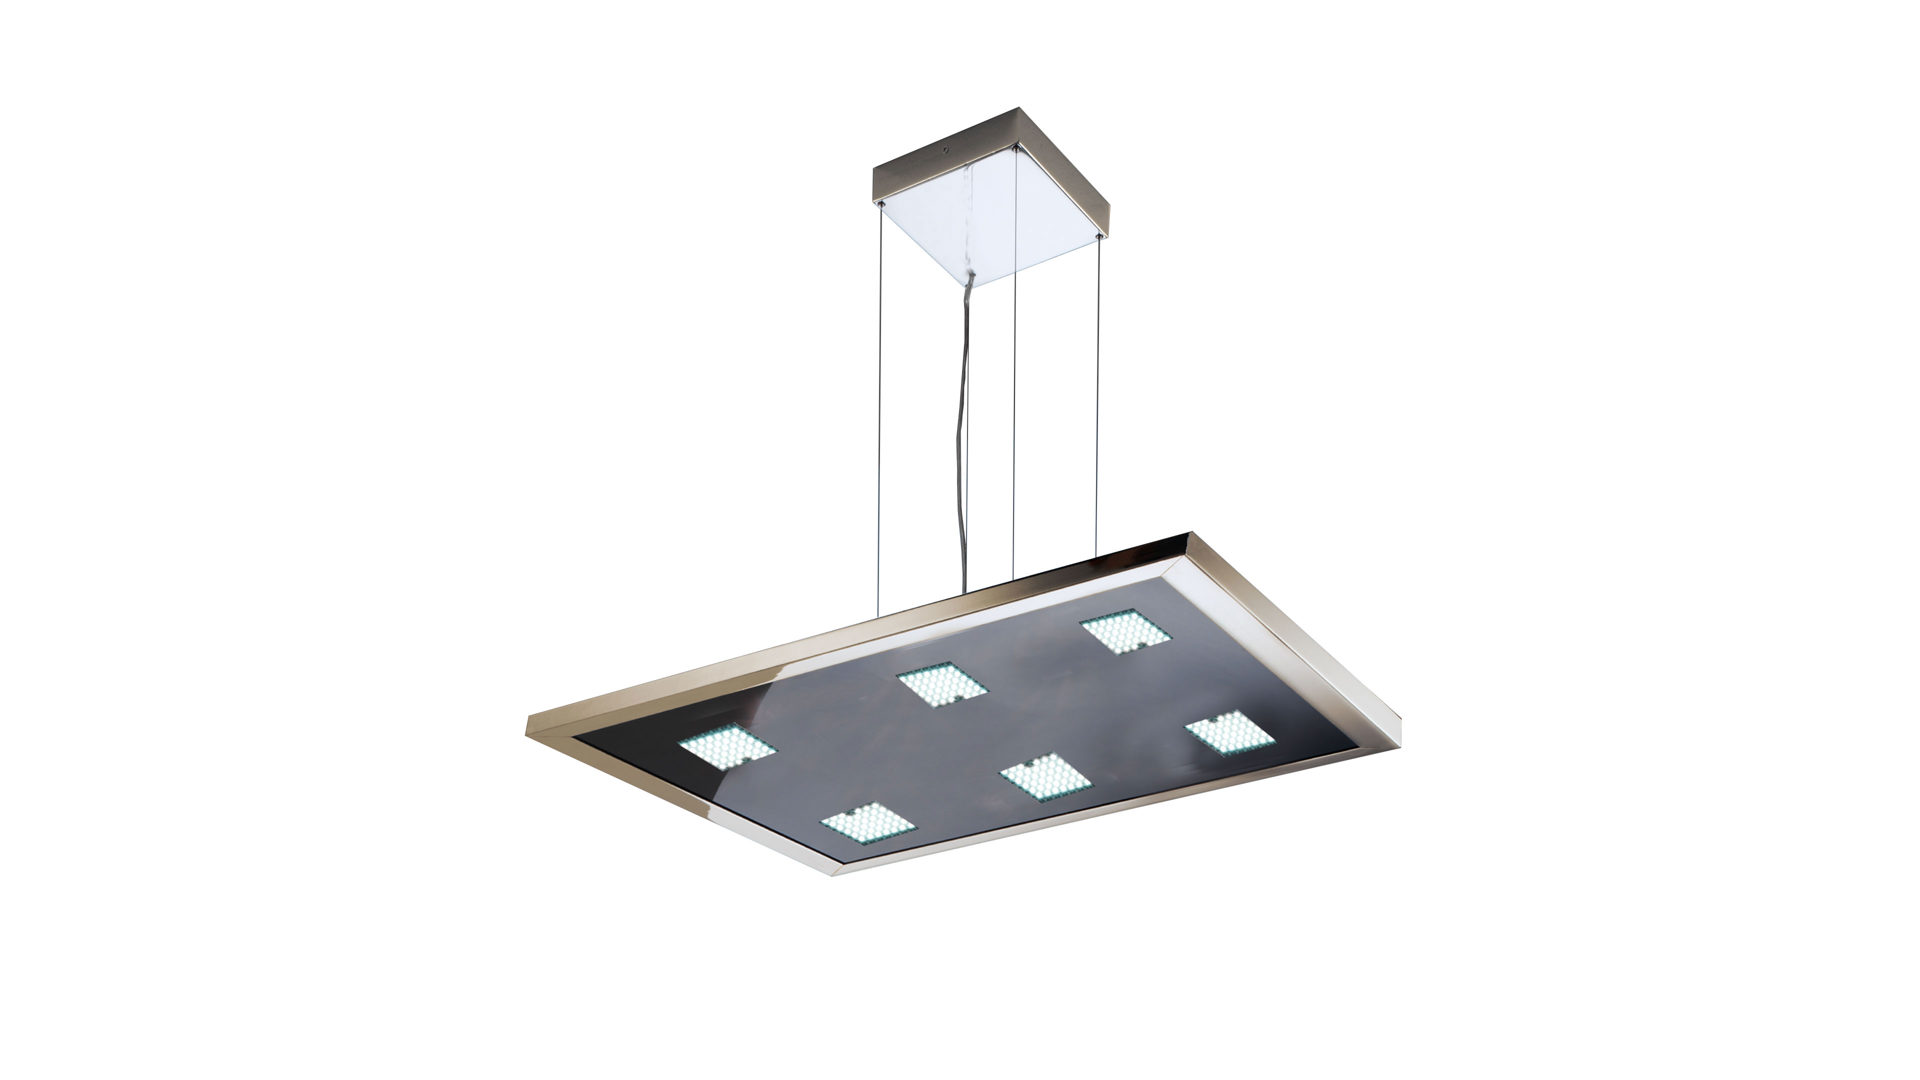 Pendelleuchte Evotec Aus Glas Metall In Schwarz EVOTEC LED Pendelleuchte  Aluminium U0026 Nickel Gebürstet,